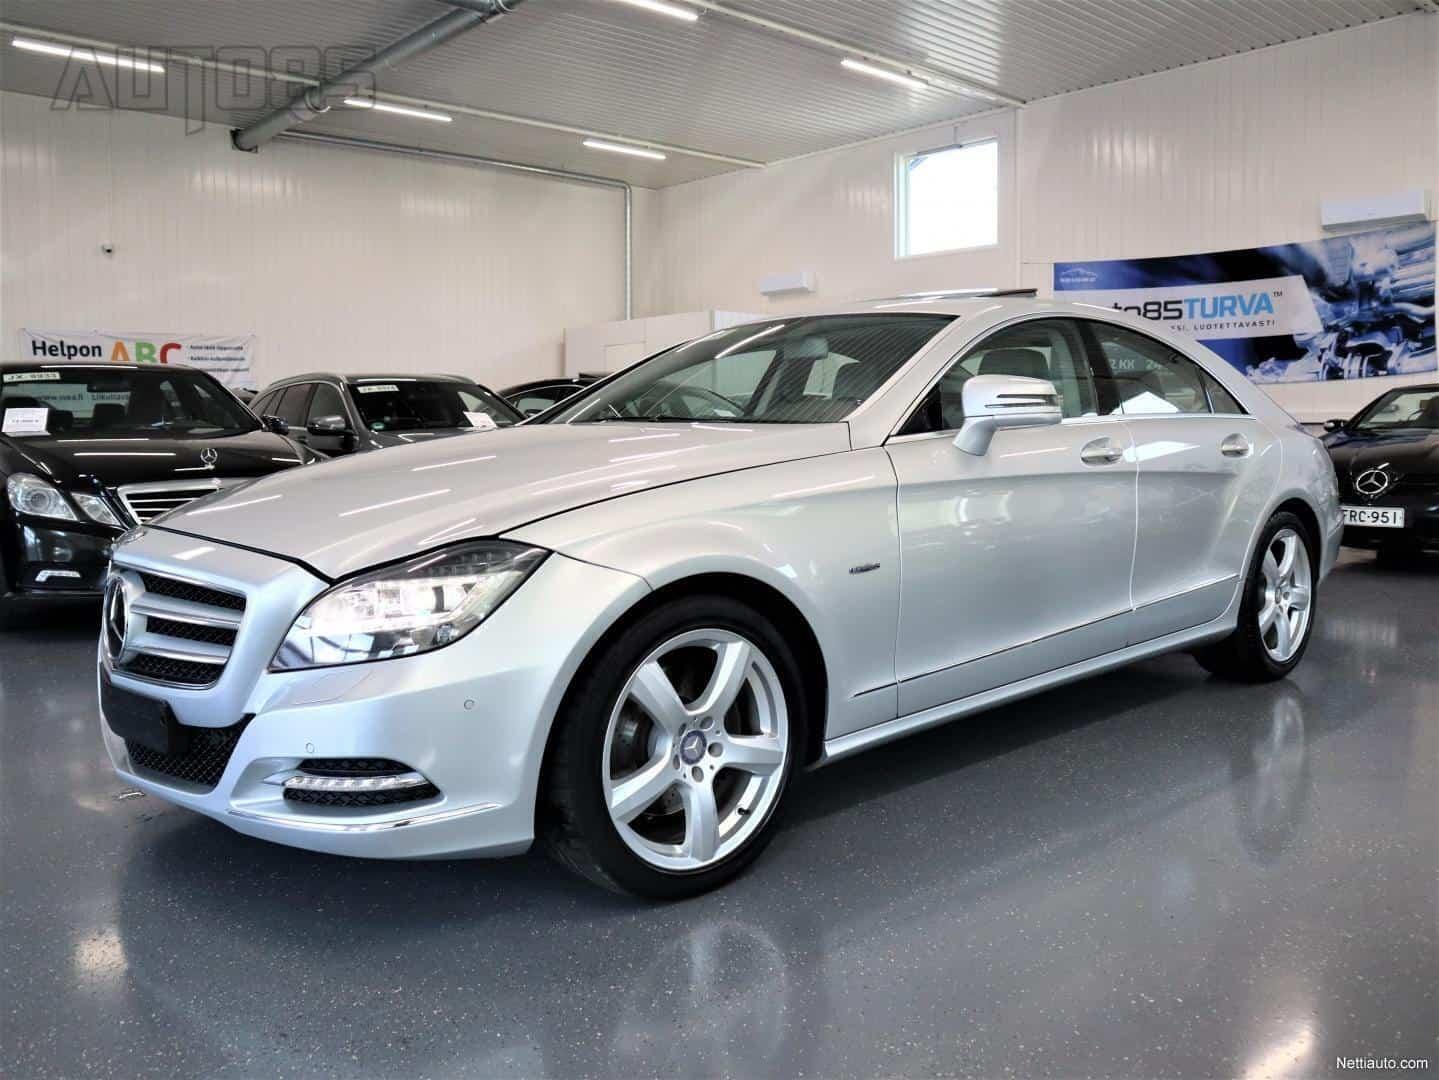 Mercedes-Benz CLS 350 CDI BlueEfficiency Aut * RAHOITUS 0e KÄSIRAHALLA * NAHAT * KLUUKKU * KAISTAVAHTI * ILS * TUTKAT * DISTRONIC+ YMS